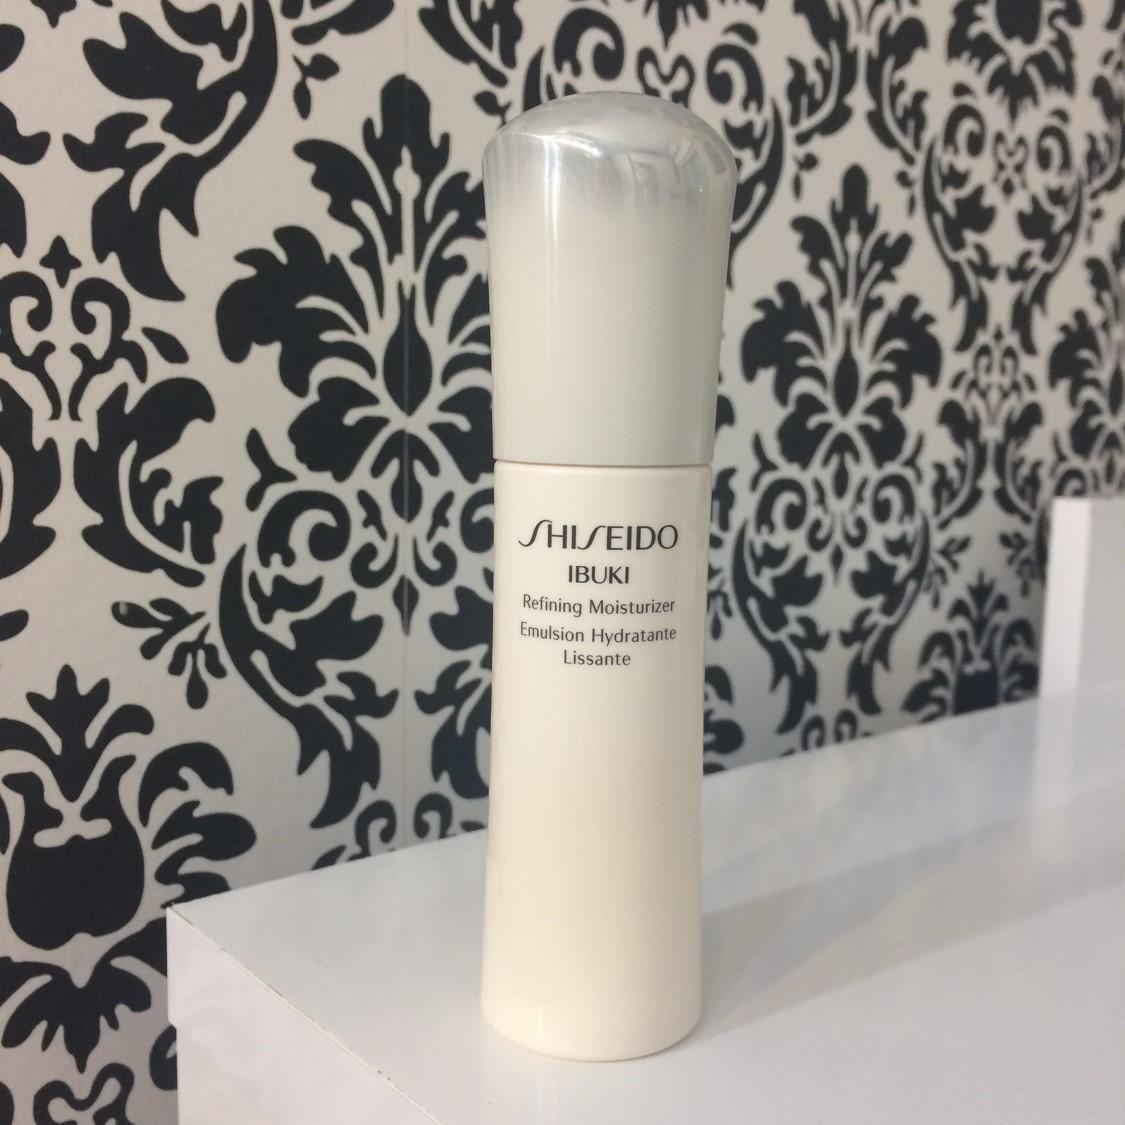 Hidratante Facial Shiseido Ibuki Refining Moisturizer